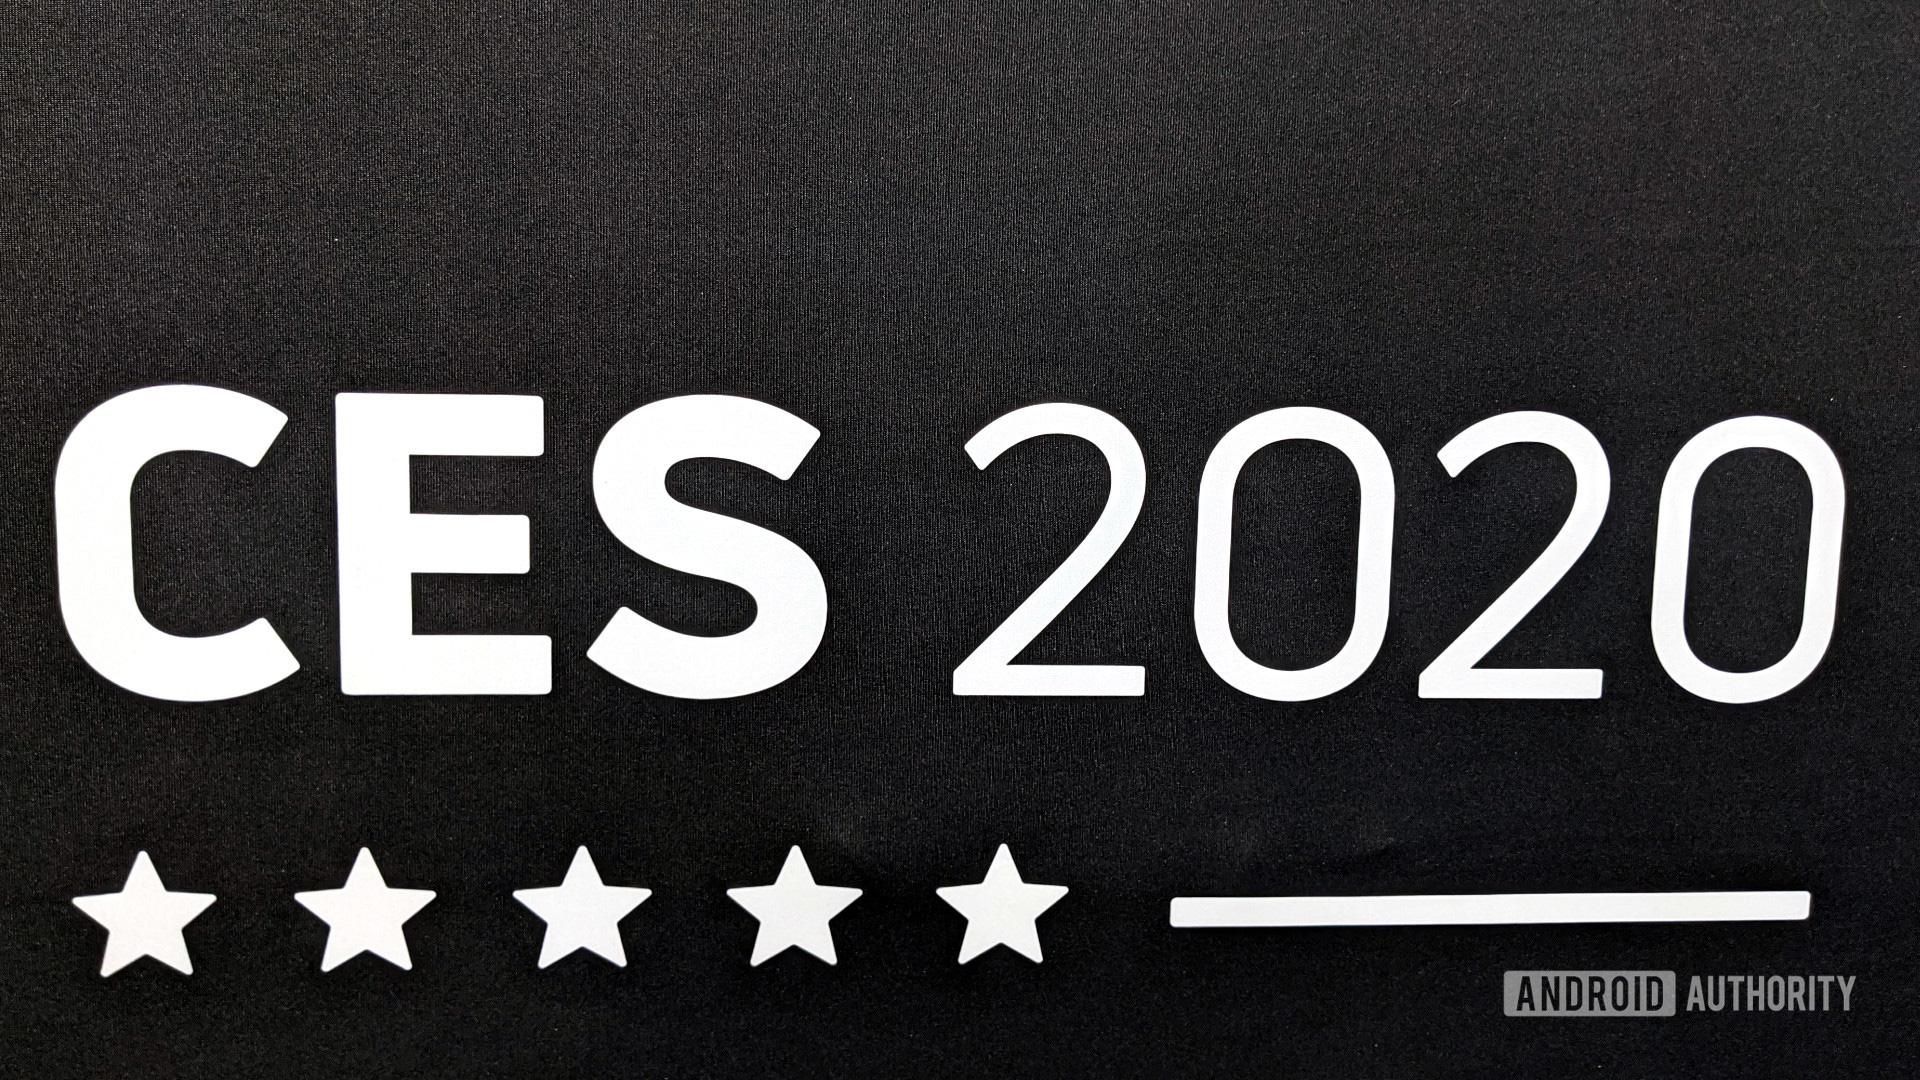 Thi truong thiet bi am thanh soi dong tai CES 2020-1